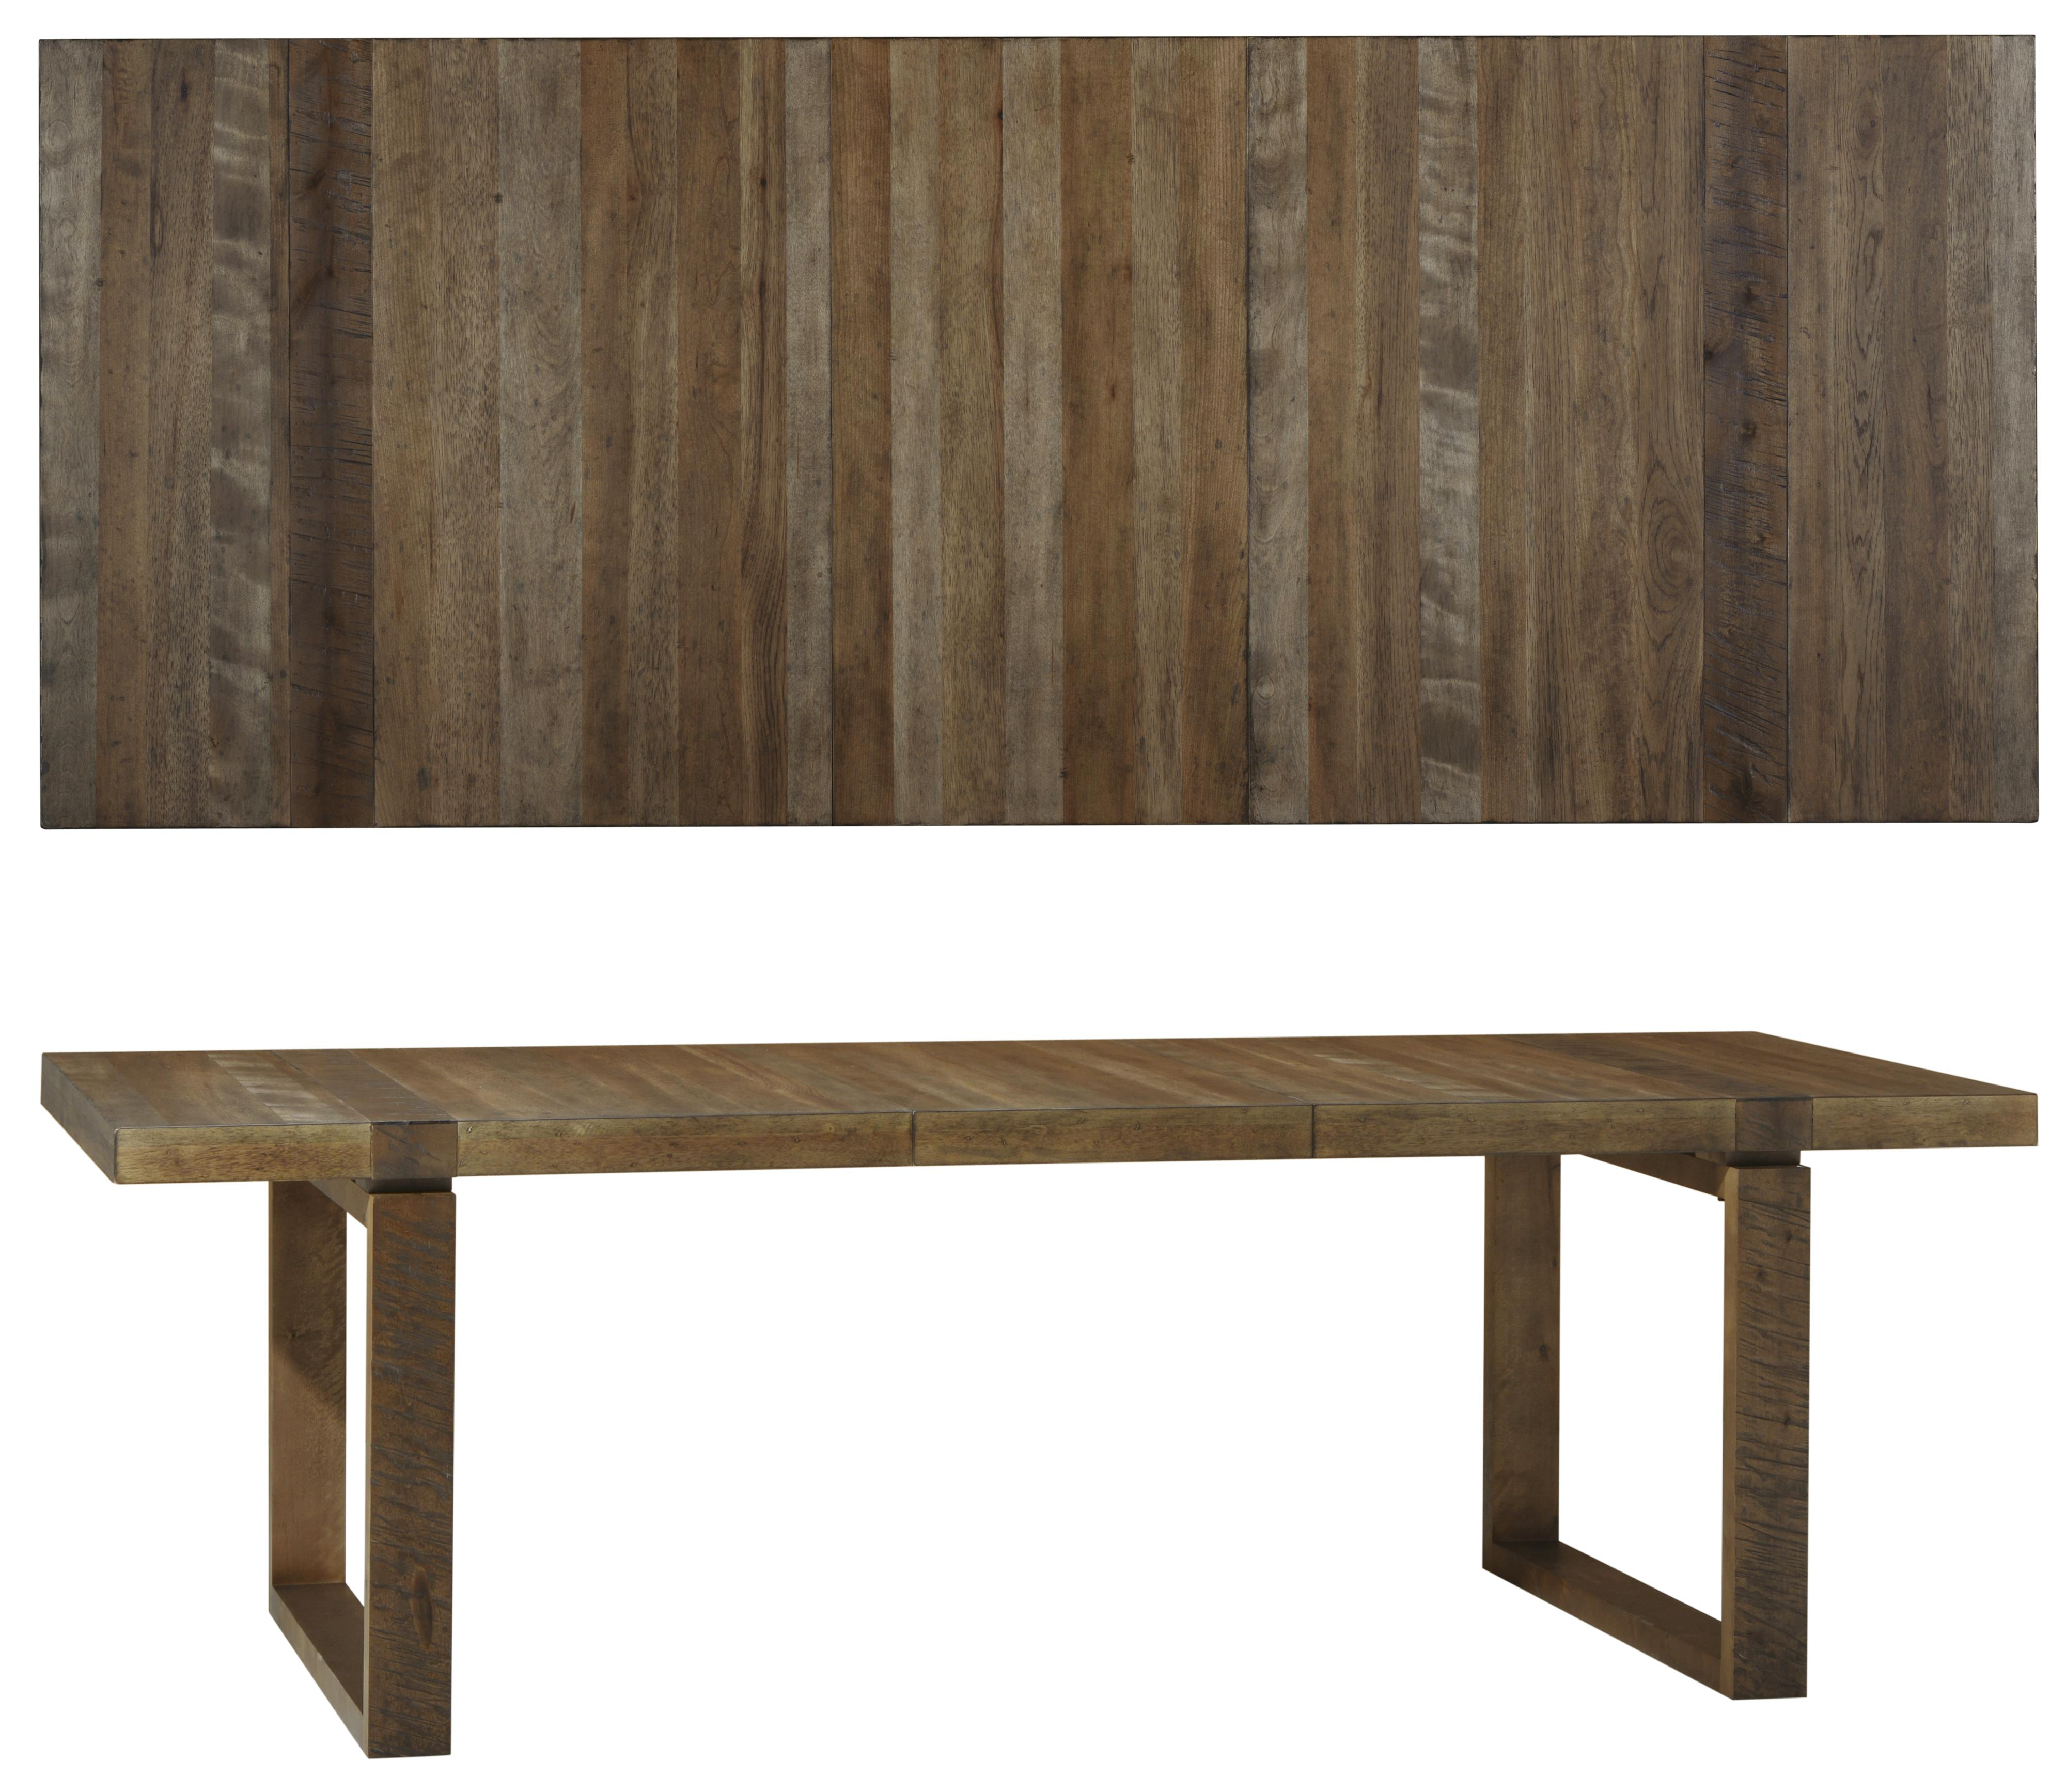 ART Furniture Inc Epicenters 7 Piece Williamsburg  : products2Fartfurnitureinc2Fcolor2Fepicenters223220 23022B6x223202 b5 from www.hudsonsfurniture.com size 4000 x 3470 jpeg 918kB